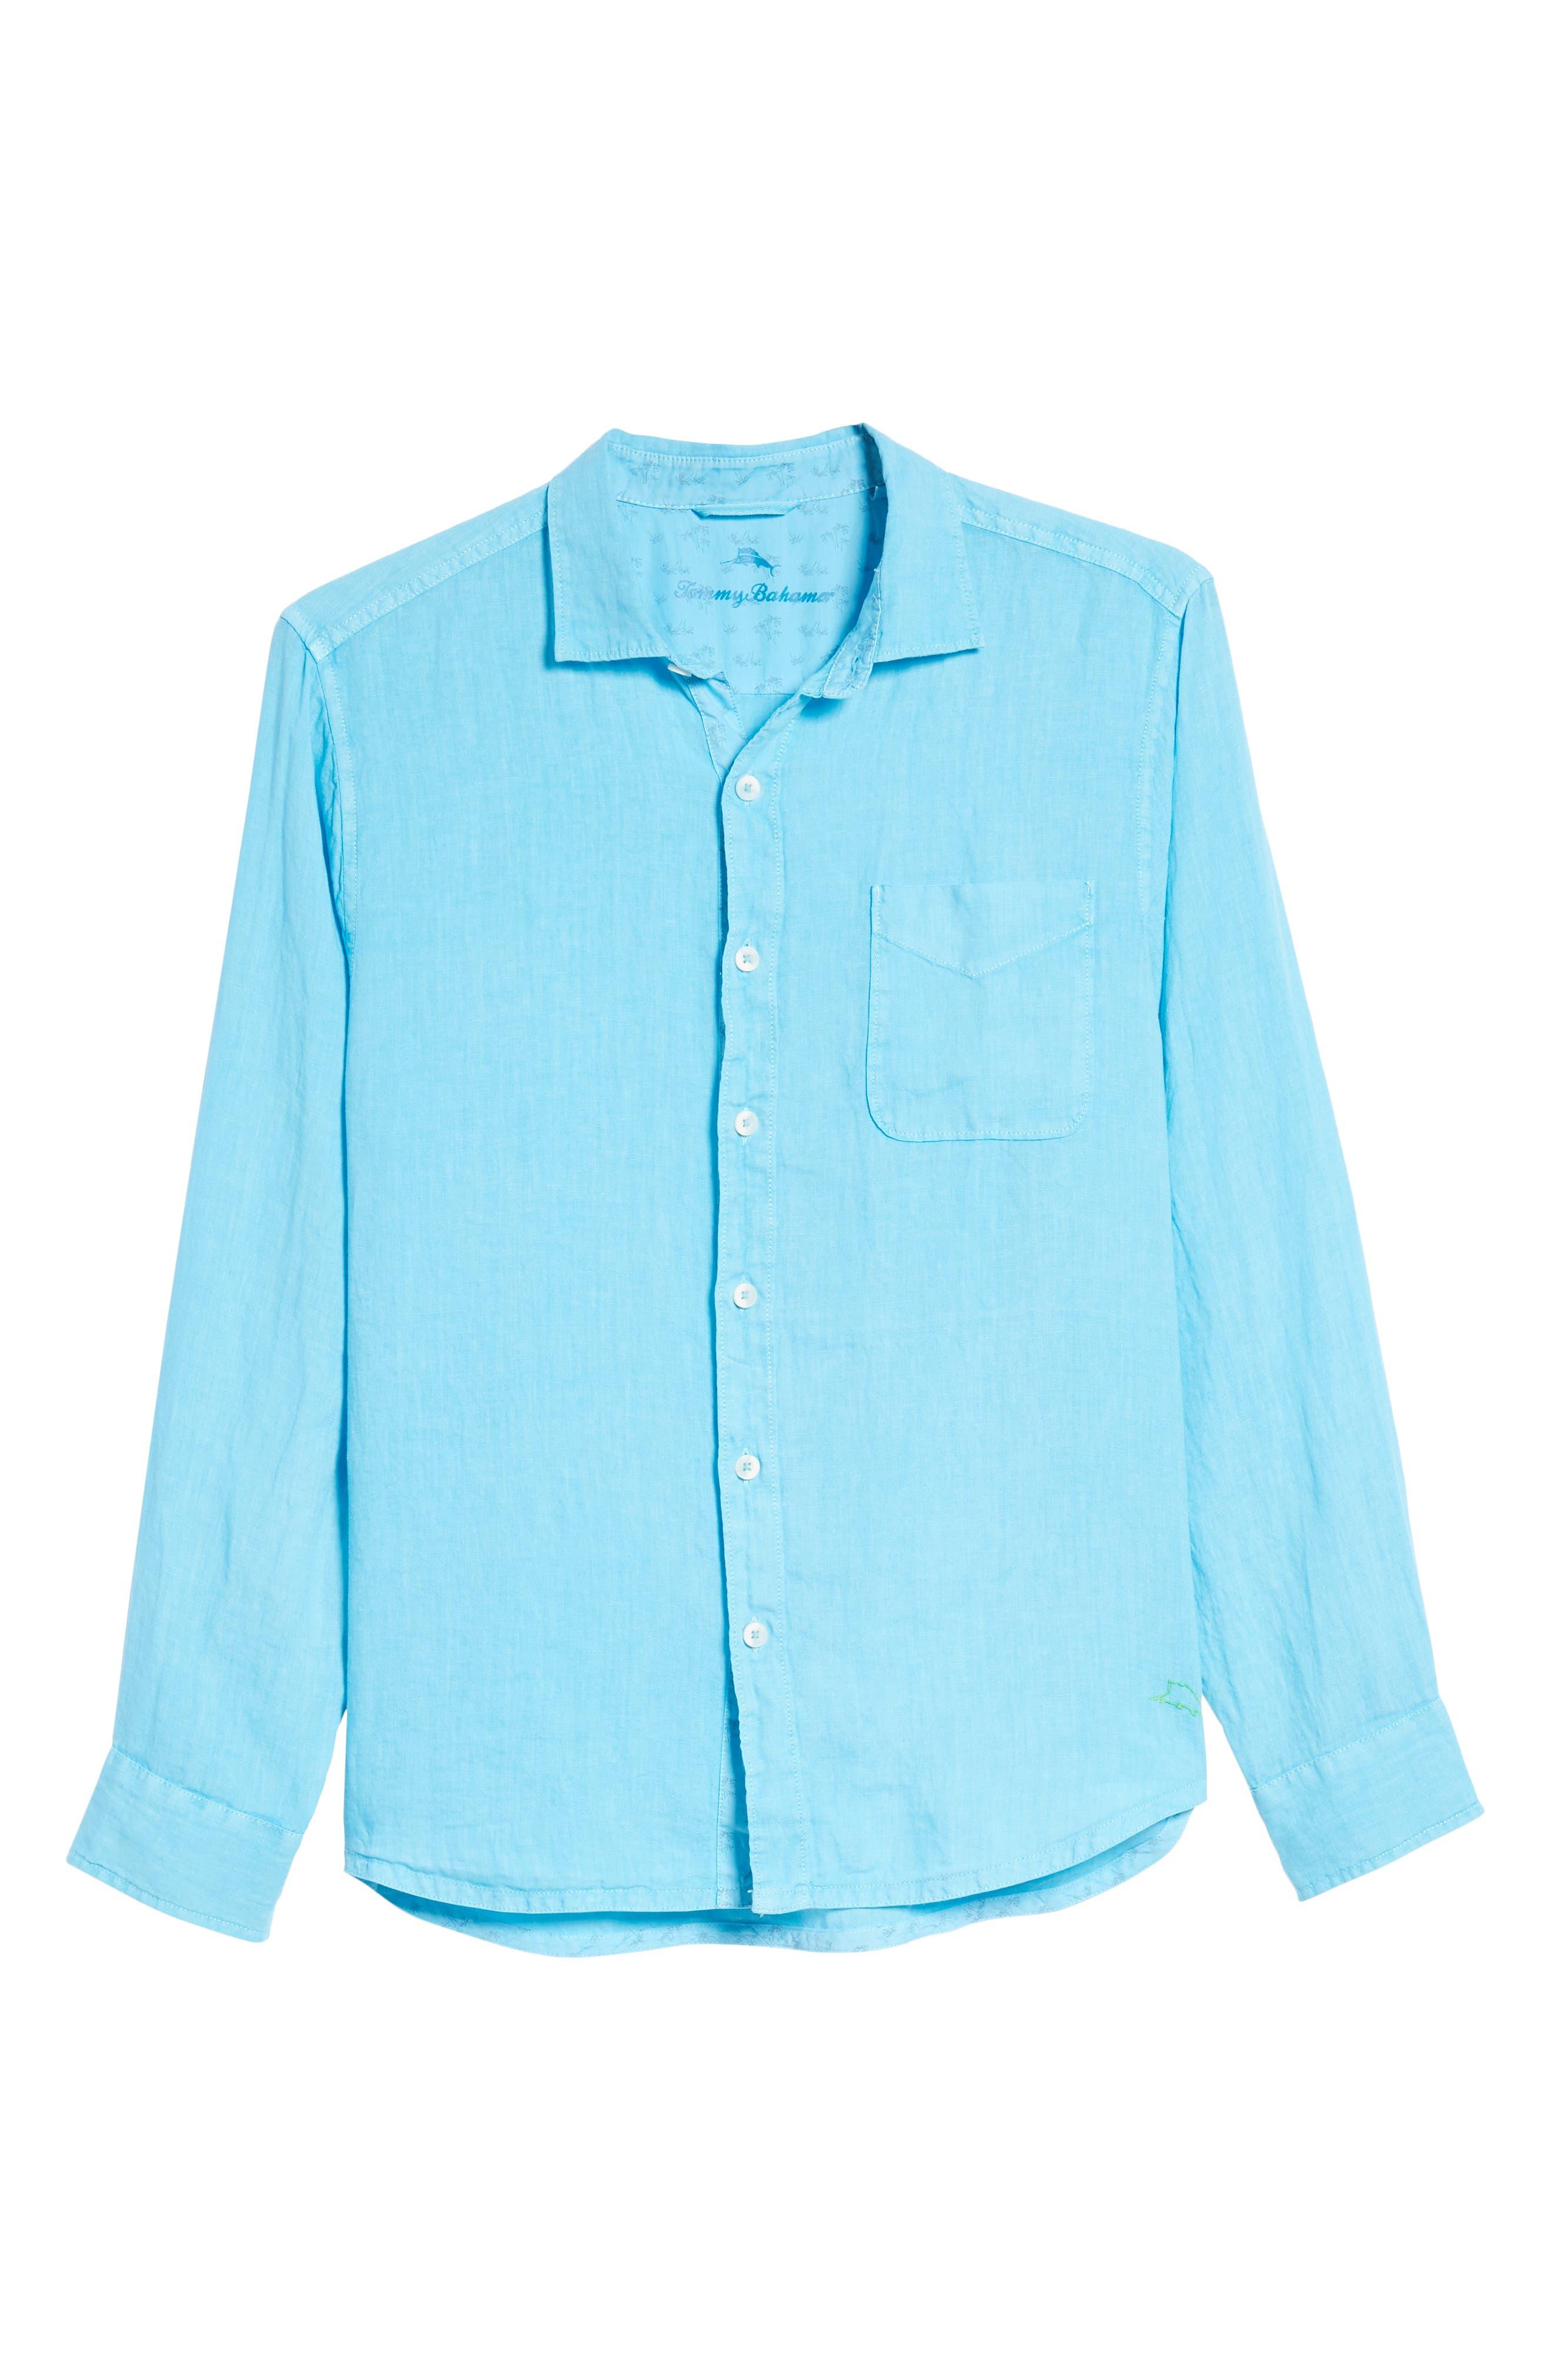 Seaspray Breezer Standard Fit Linen Sport Shirt,                             Alternate thumbnail 6, color,                             POOL PARTY BLUE